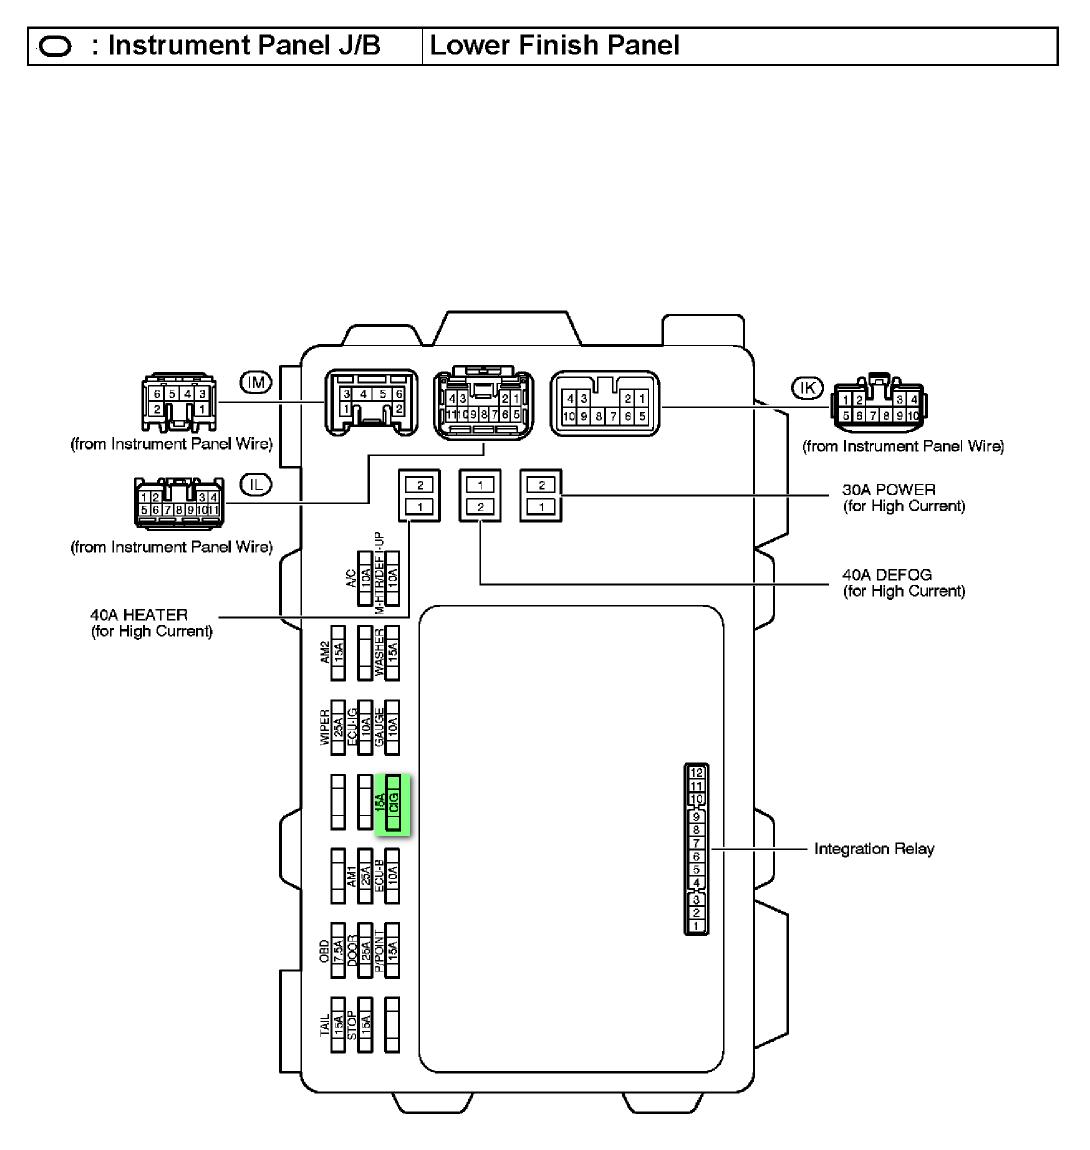 Fuse Box For 2005 Toyota Matrix Wiring Diagram User User Emilia Fise It